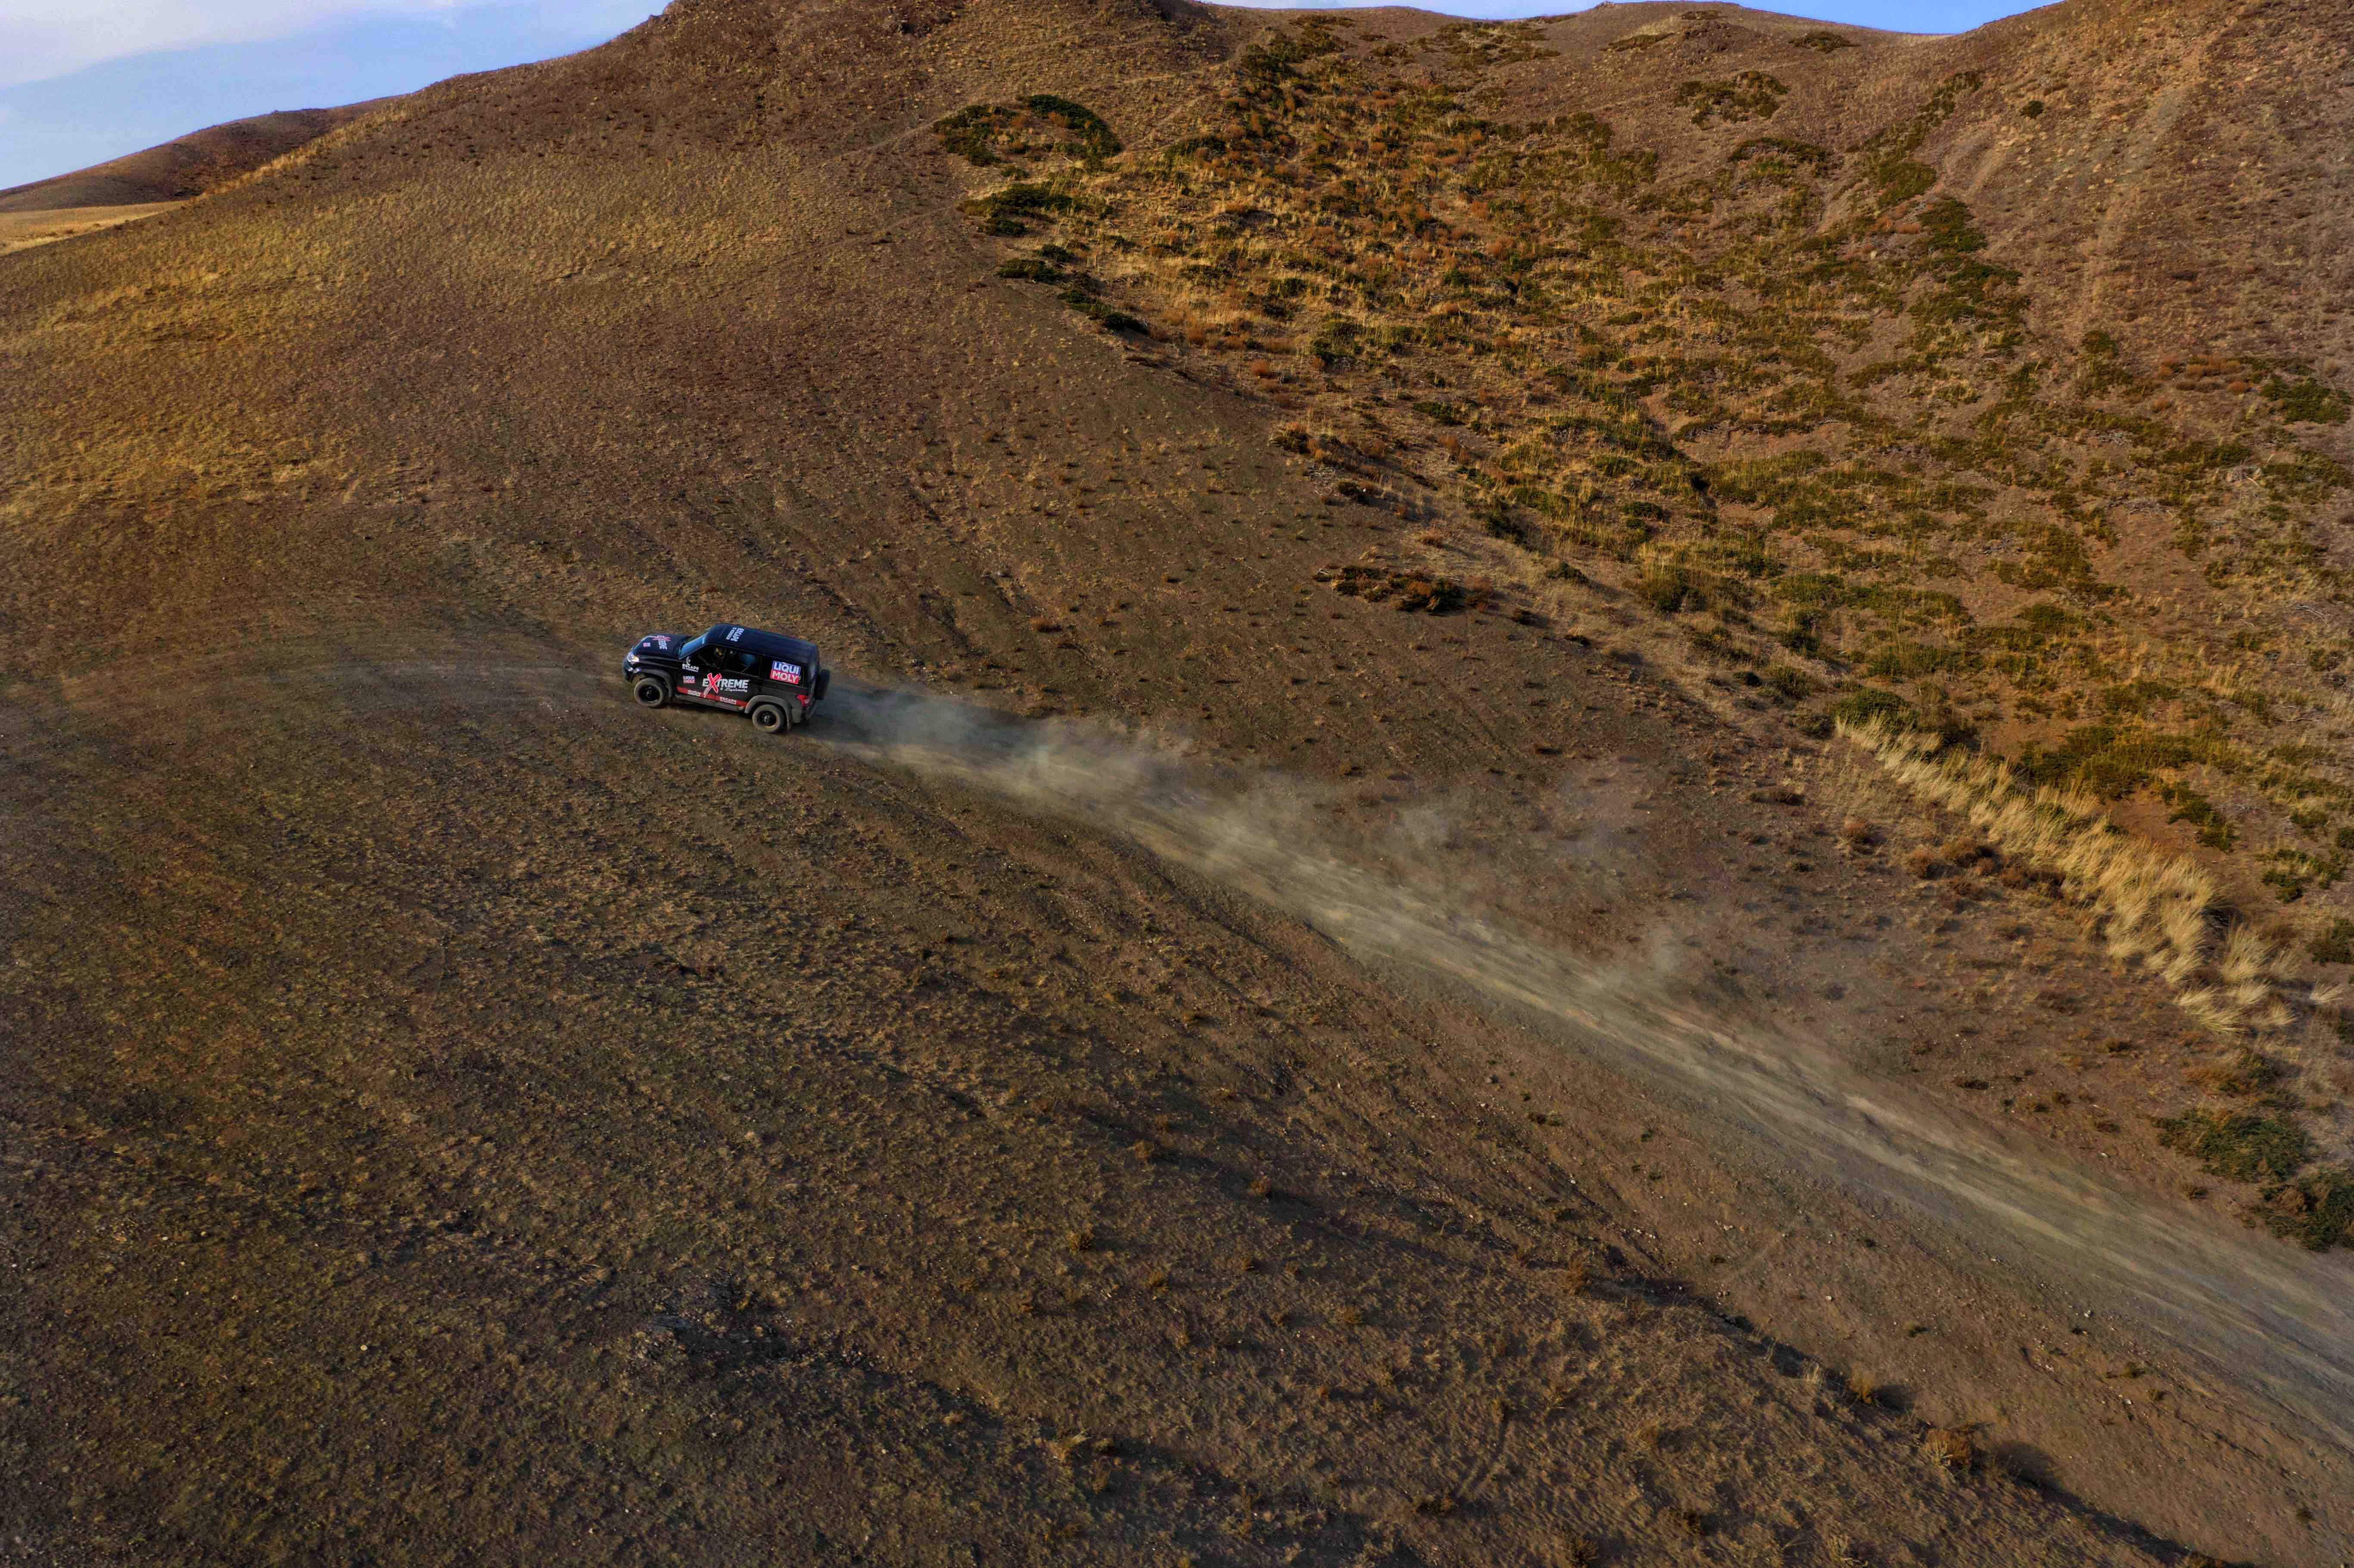 Mongolia self drive uphill